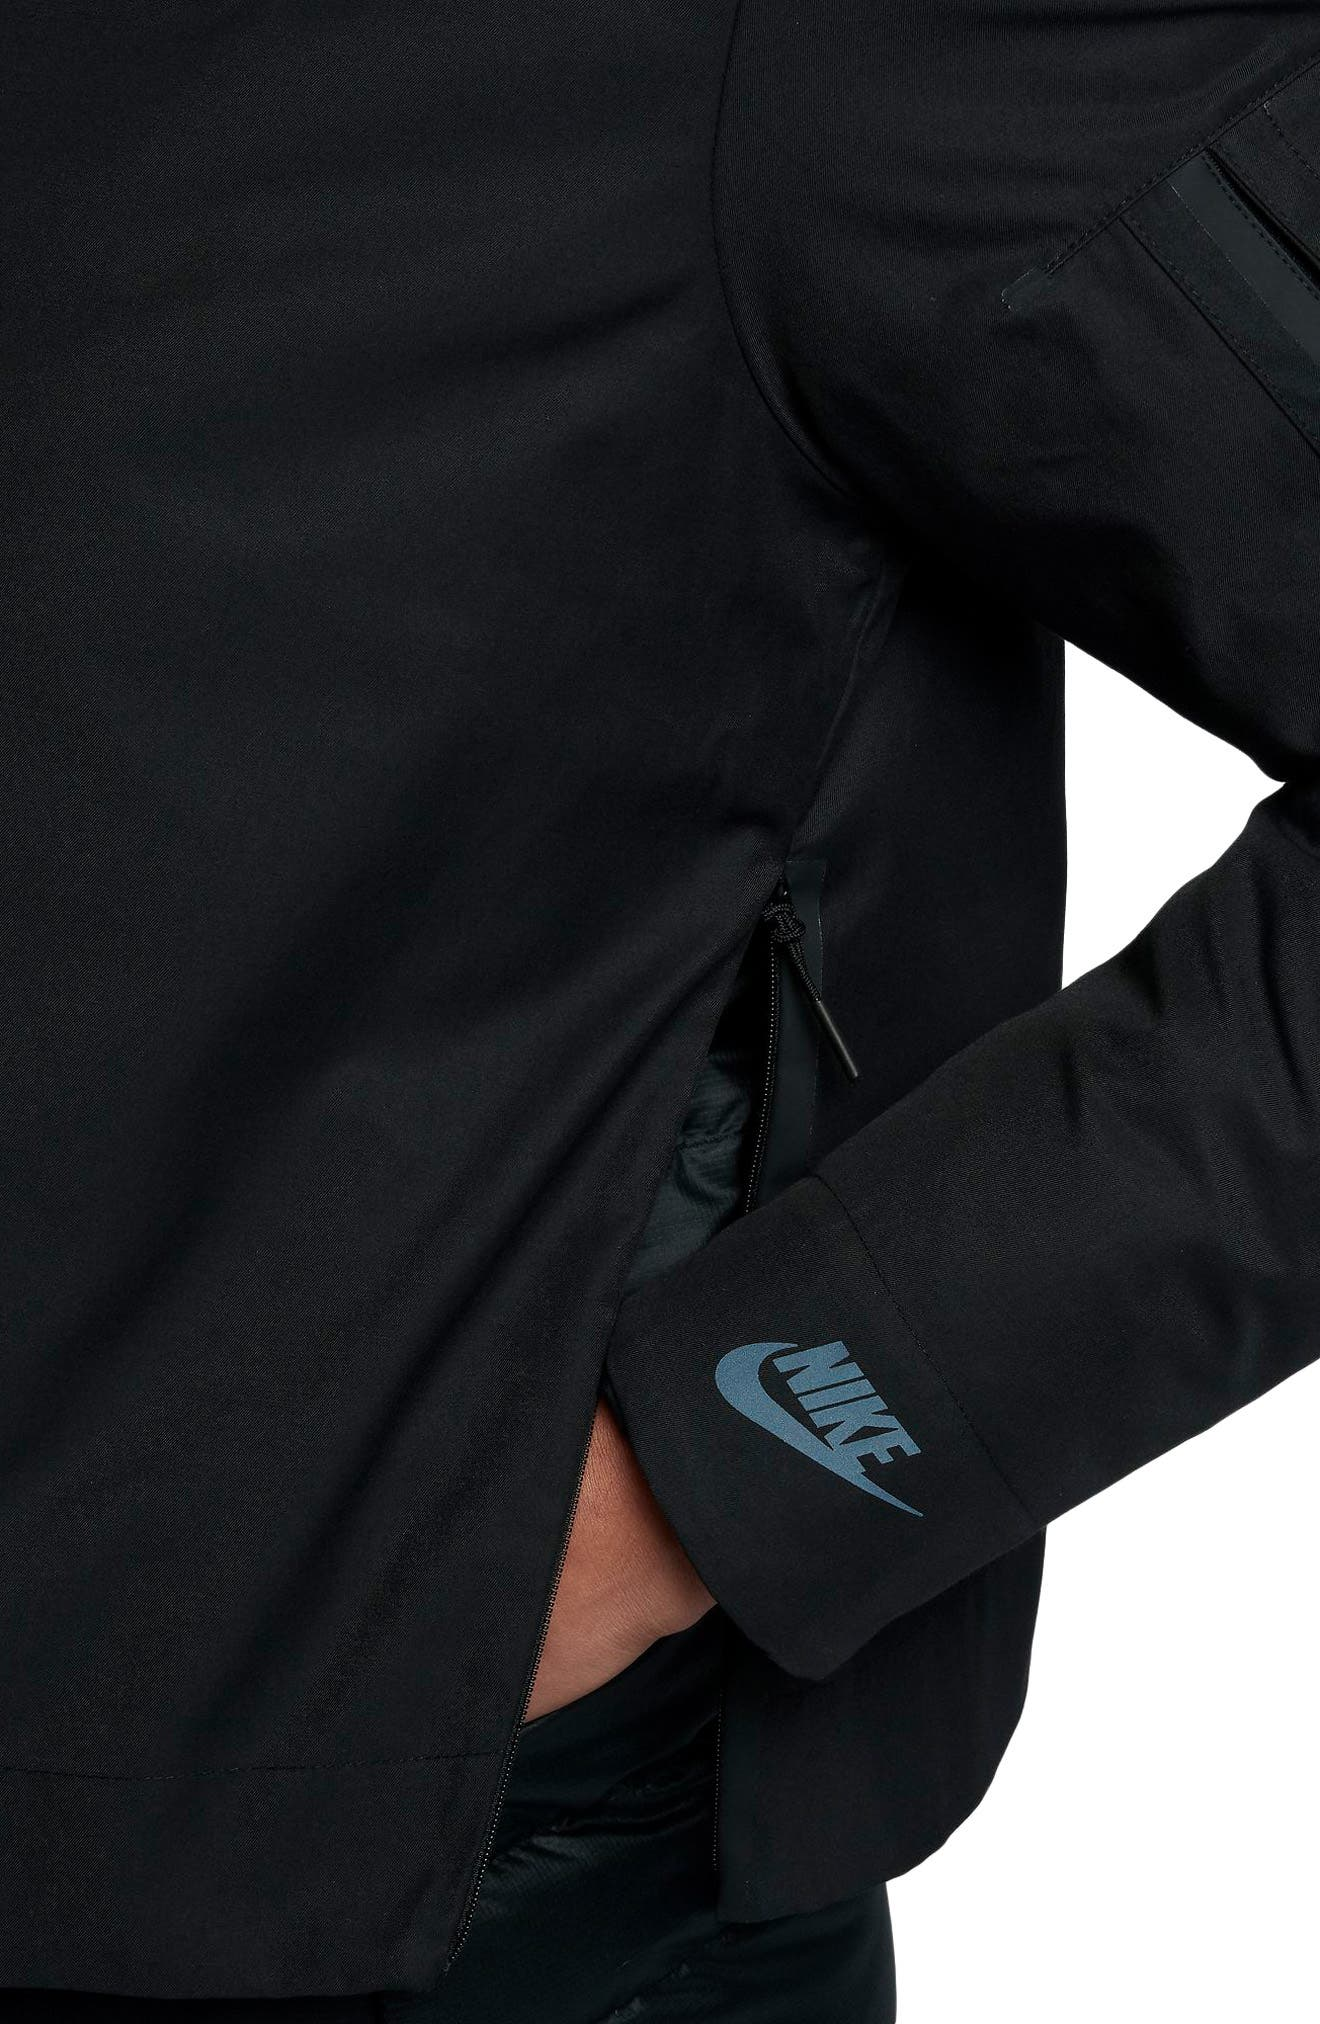 Sportswear AeroLoft 3-in-1 Down Jacket,                             Alternate thumbnail 8, color,                             Black/ Black/ Black